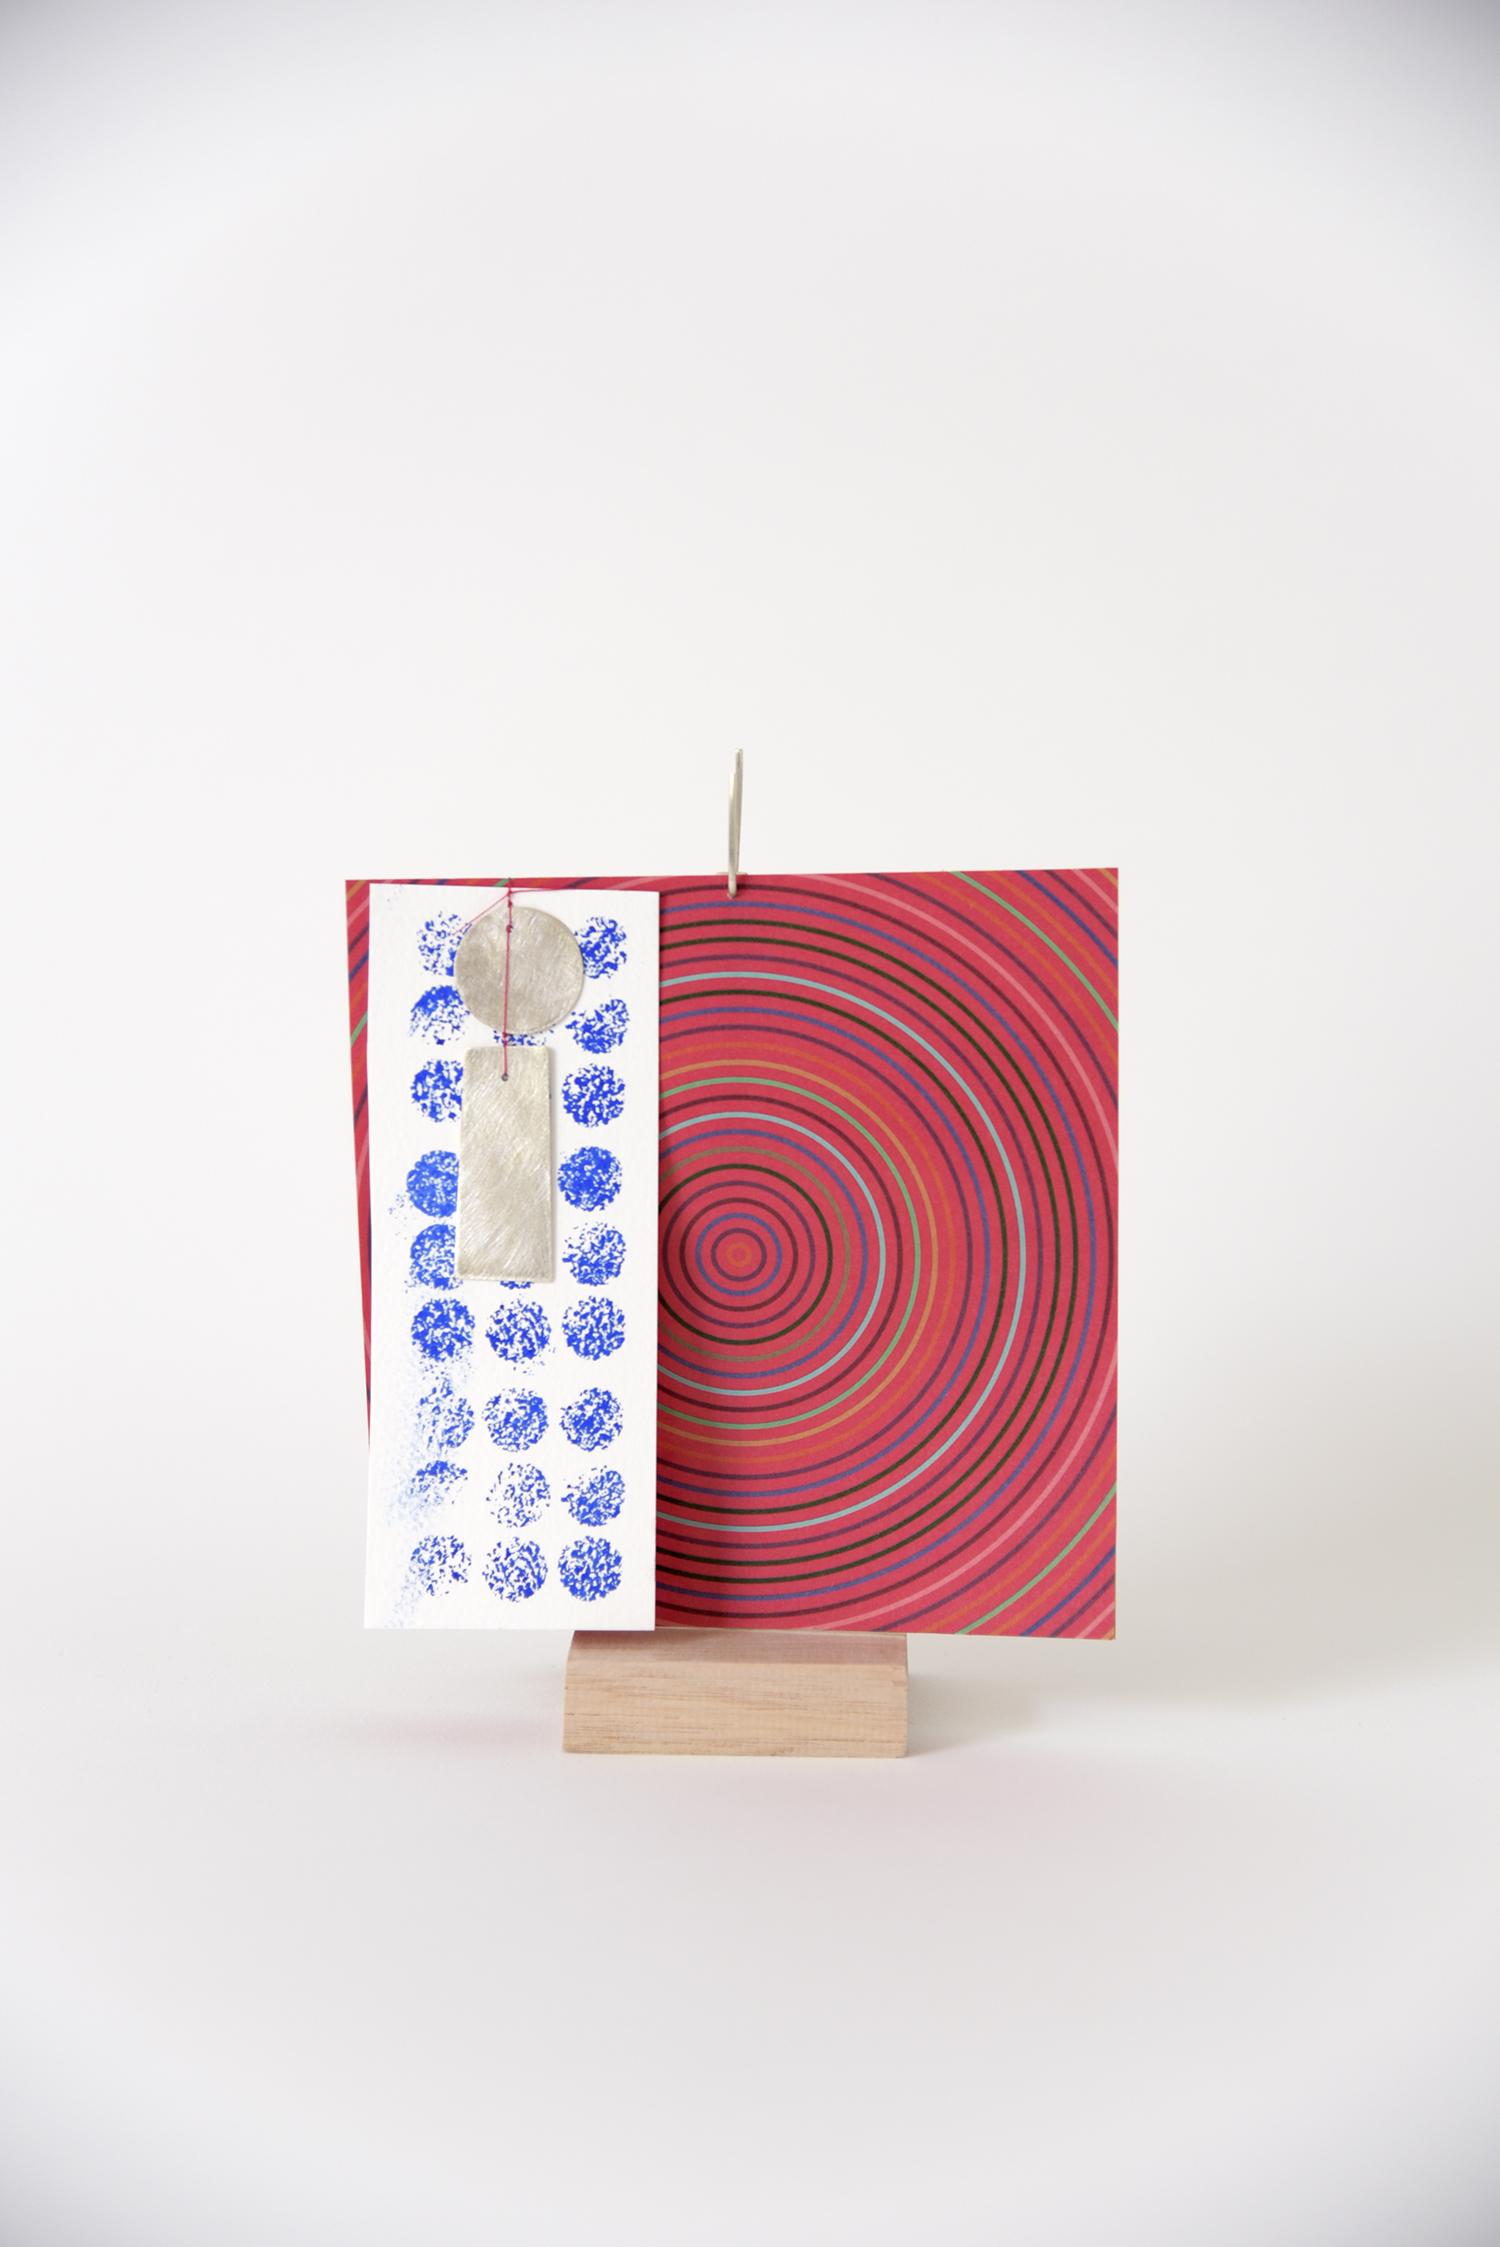 Hardbody Sculpture (Object) XI (front)